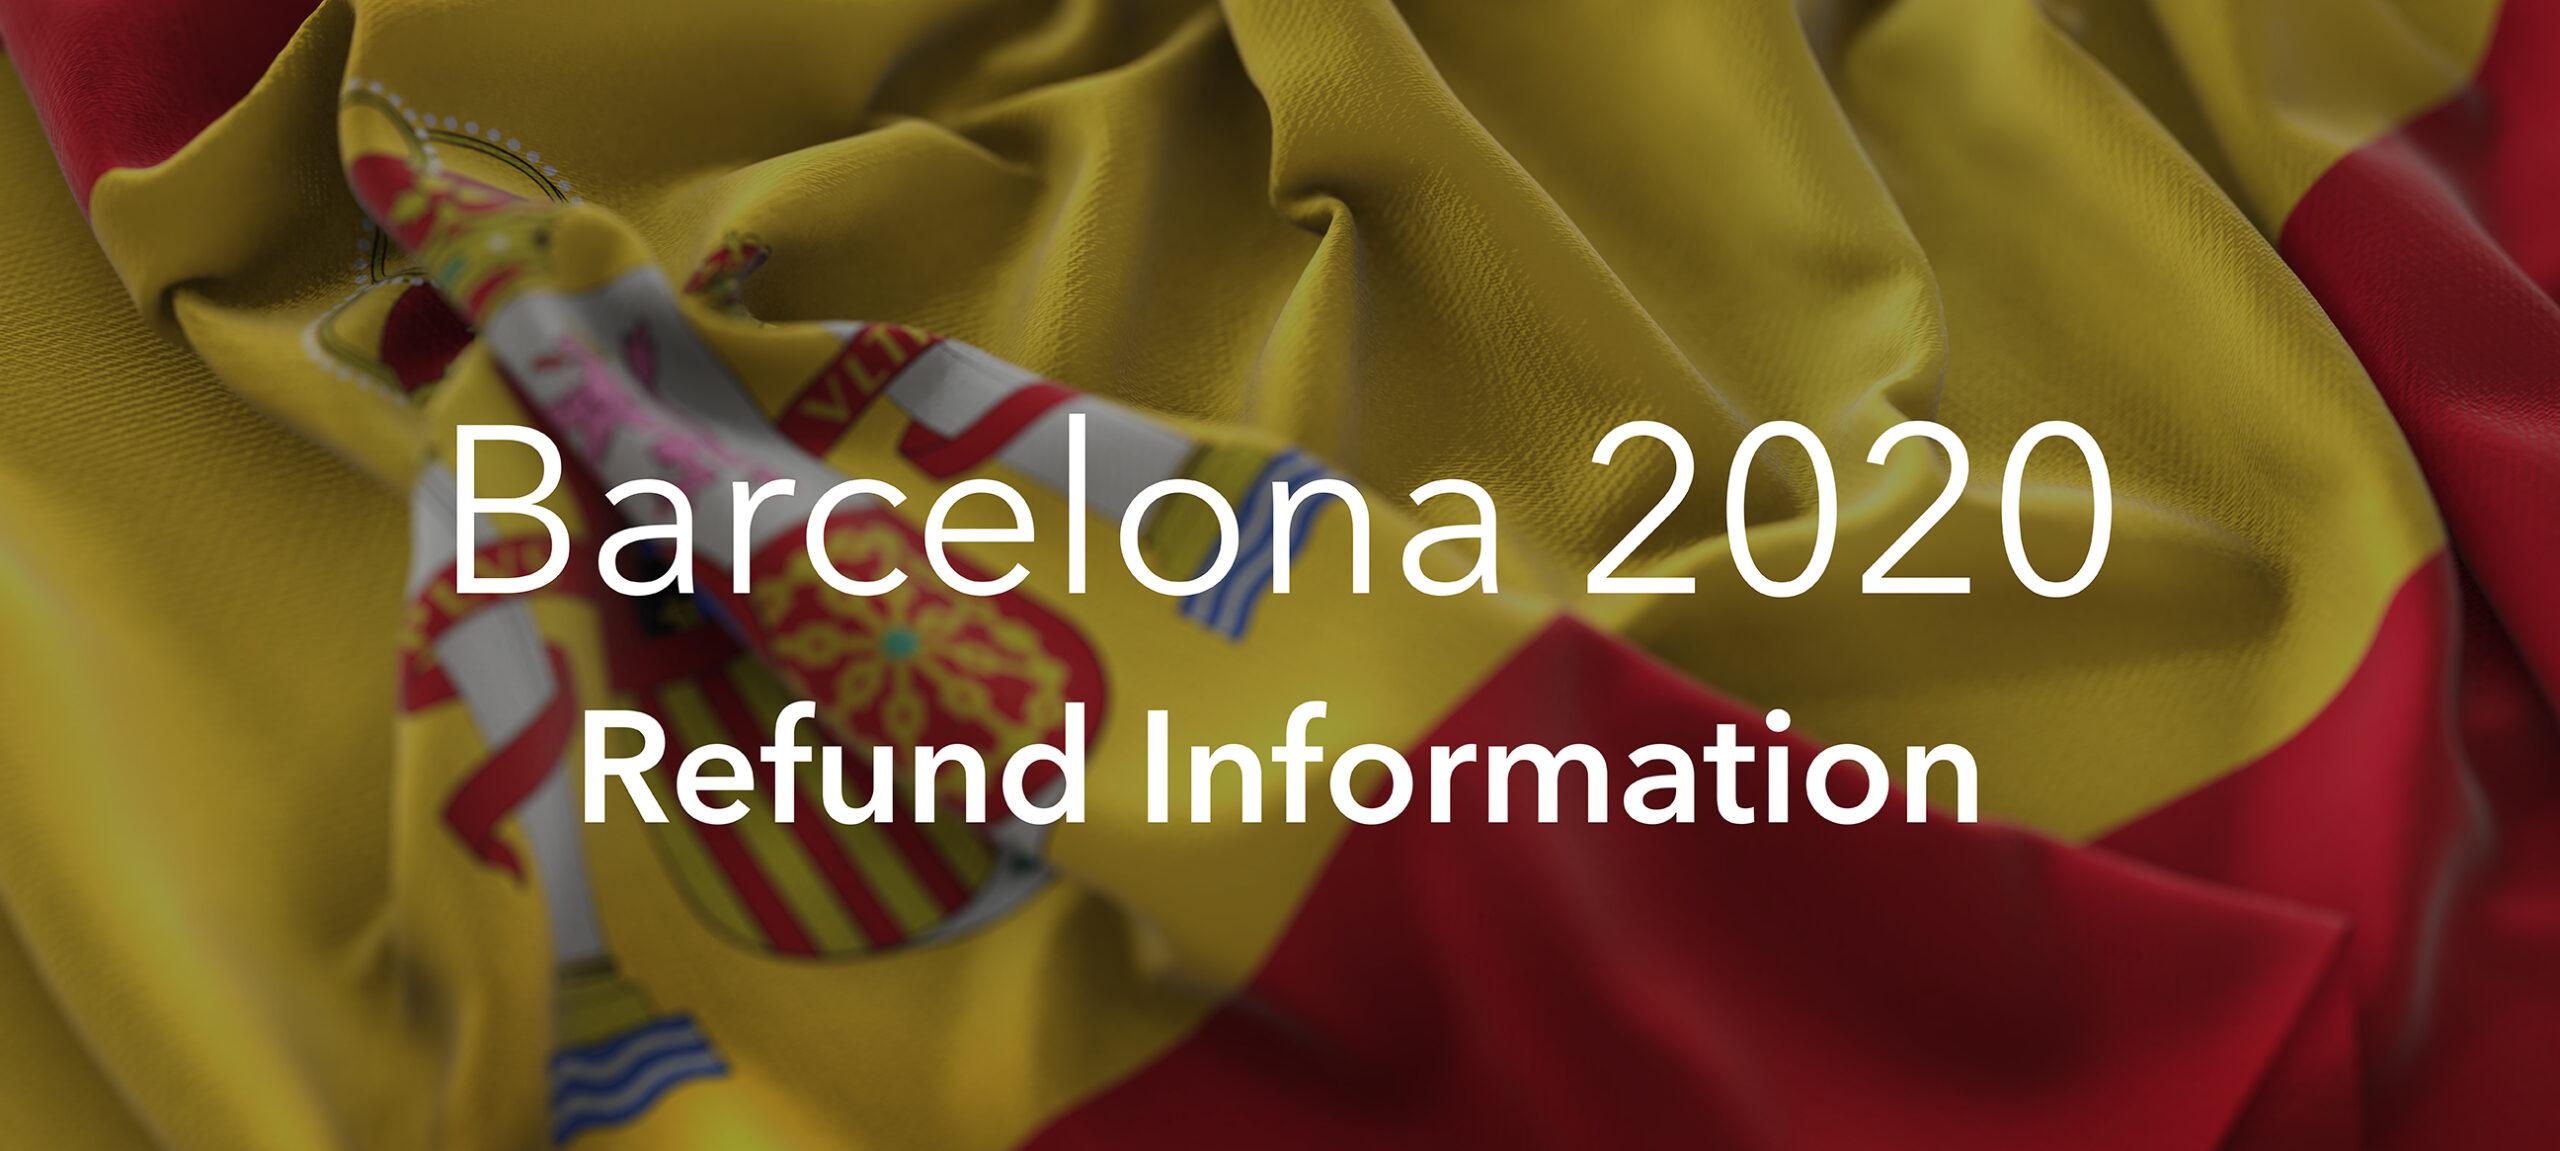 Barcelona 2020 trip refunds